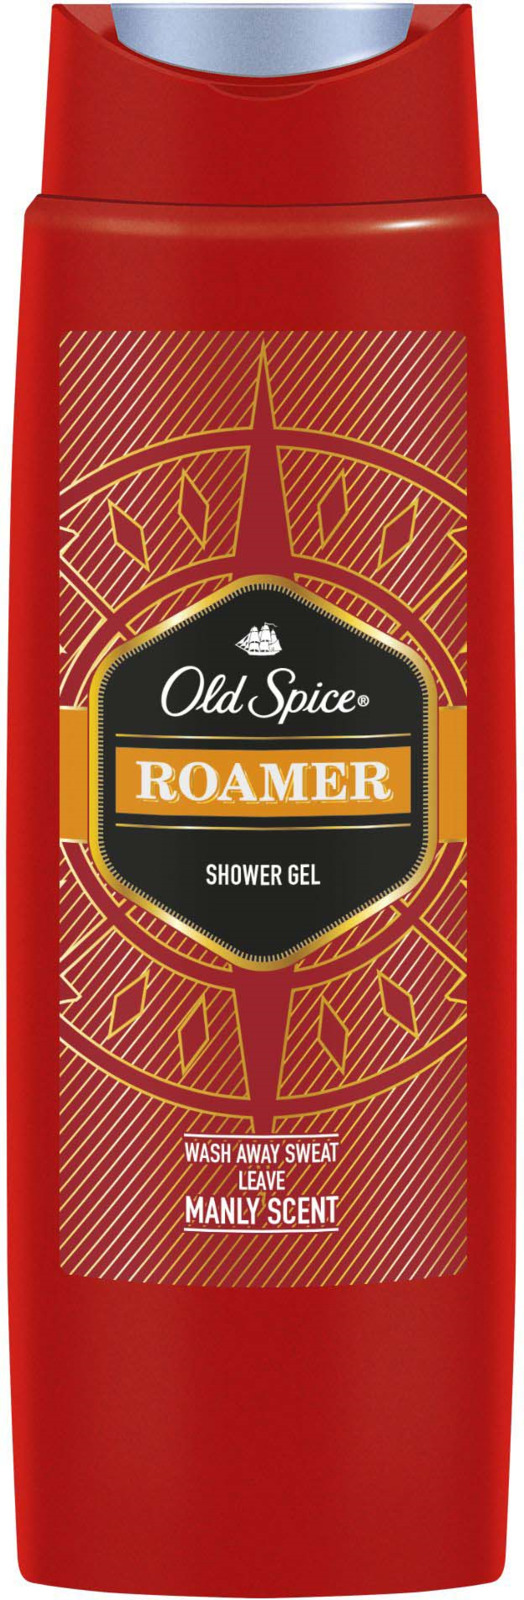 Гель для душа Old Spice Roamer 2 в 1, 400 мл